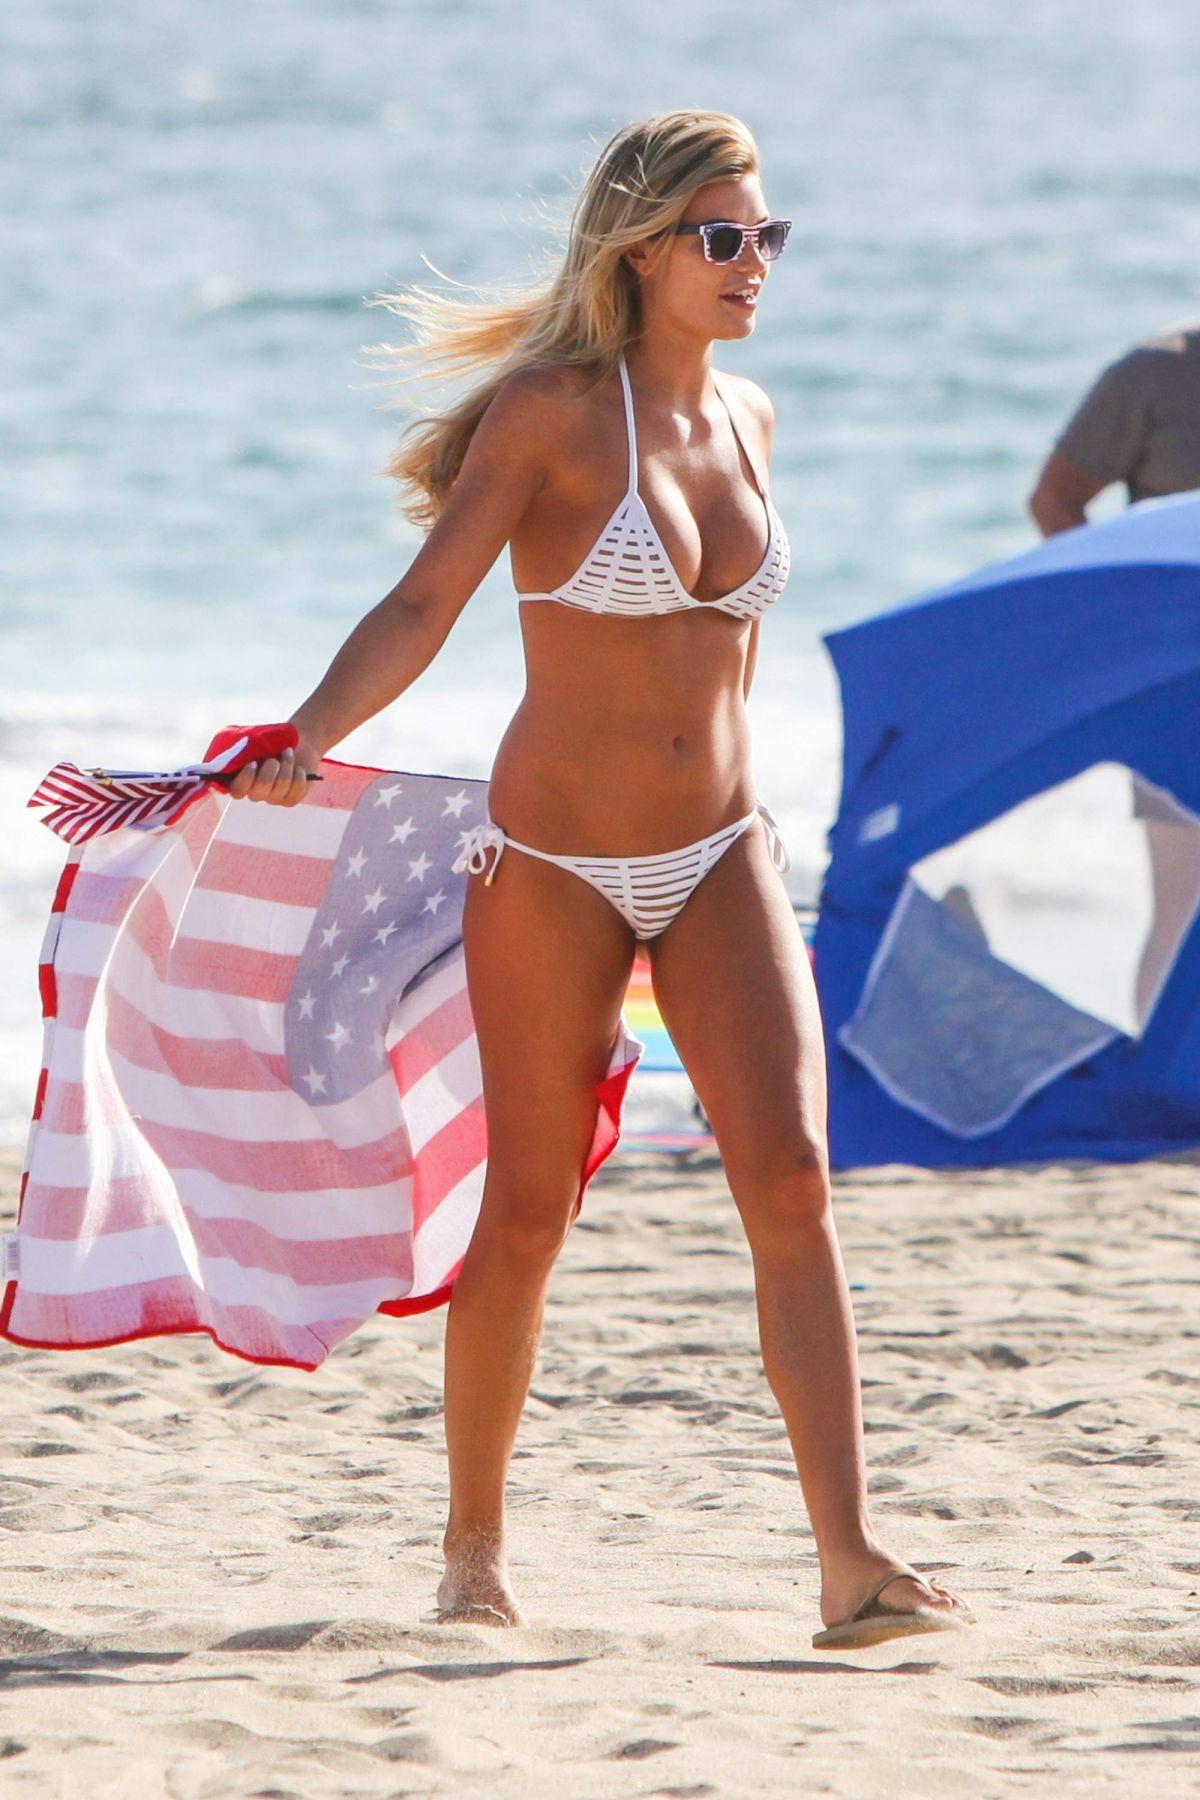 T Free Sex, Free Porn, Free Direct Samantha busch bikini pictures